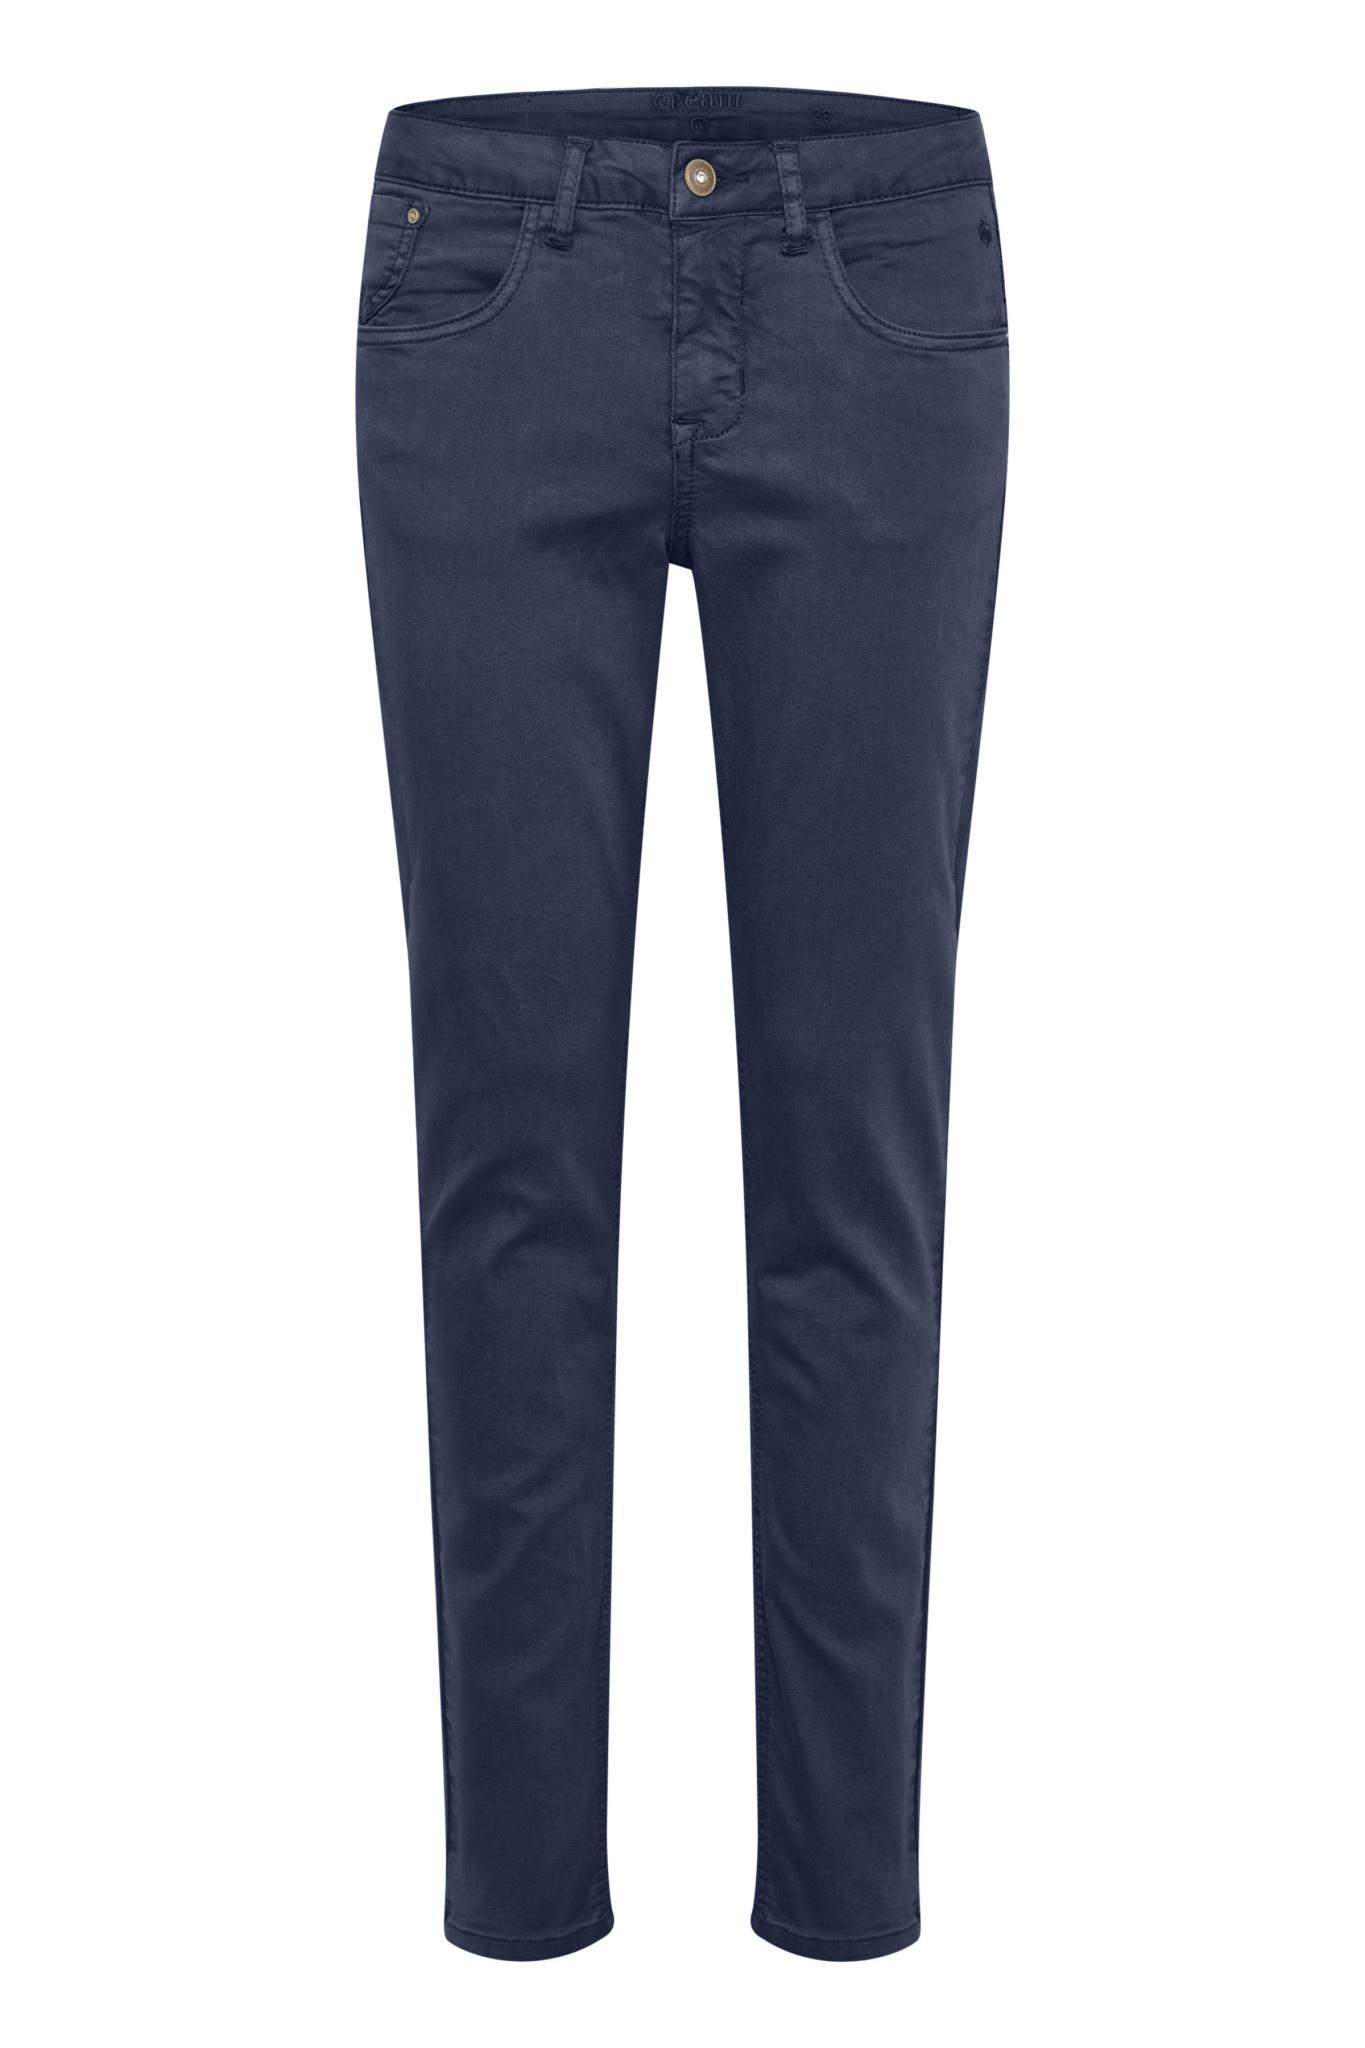 Lotte Jeans